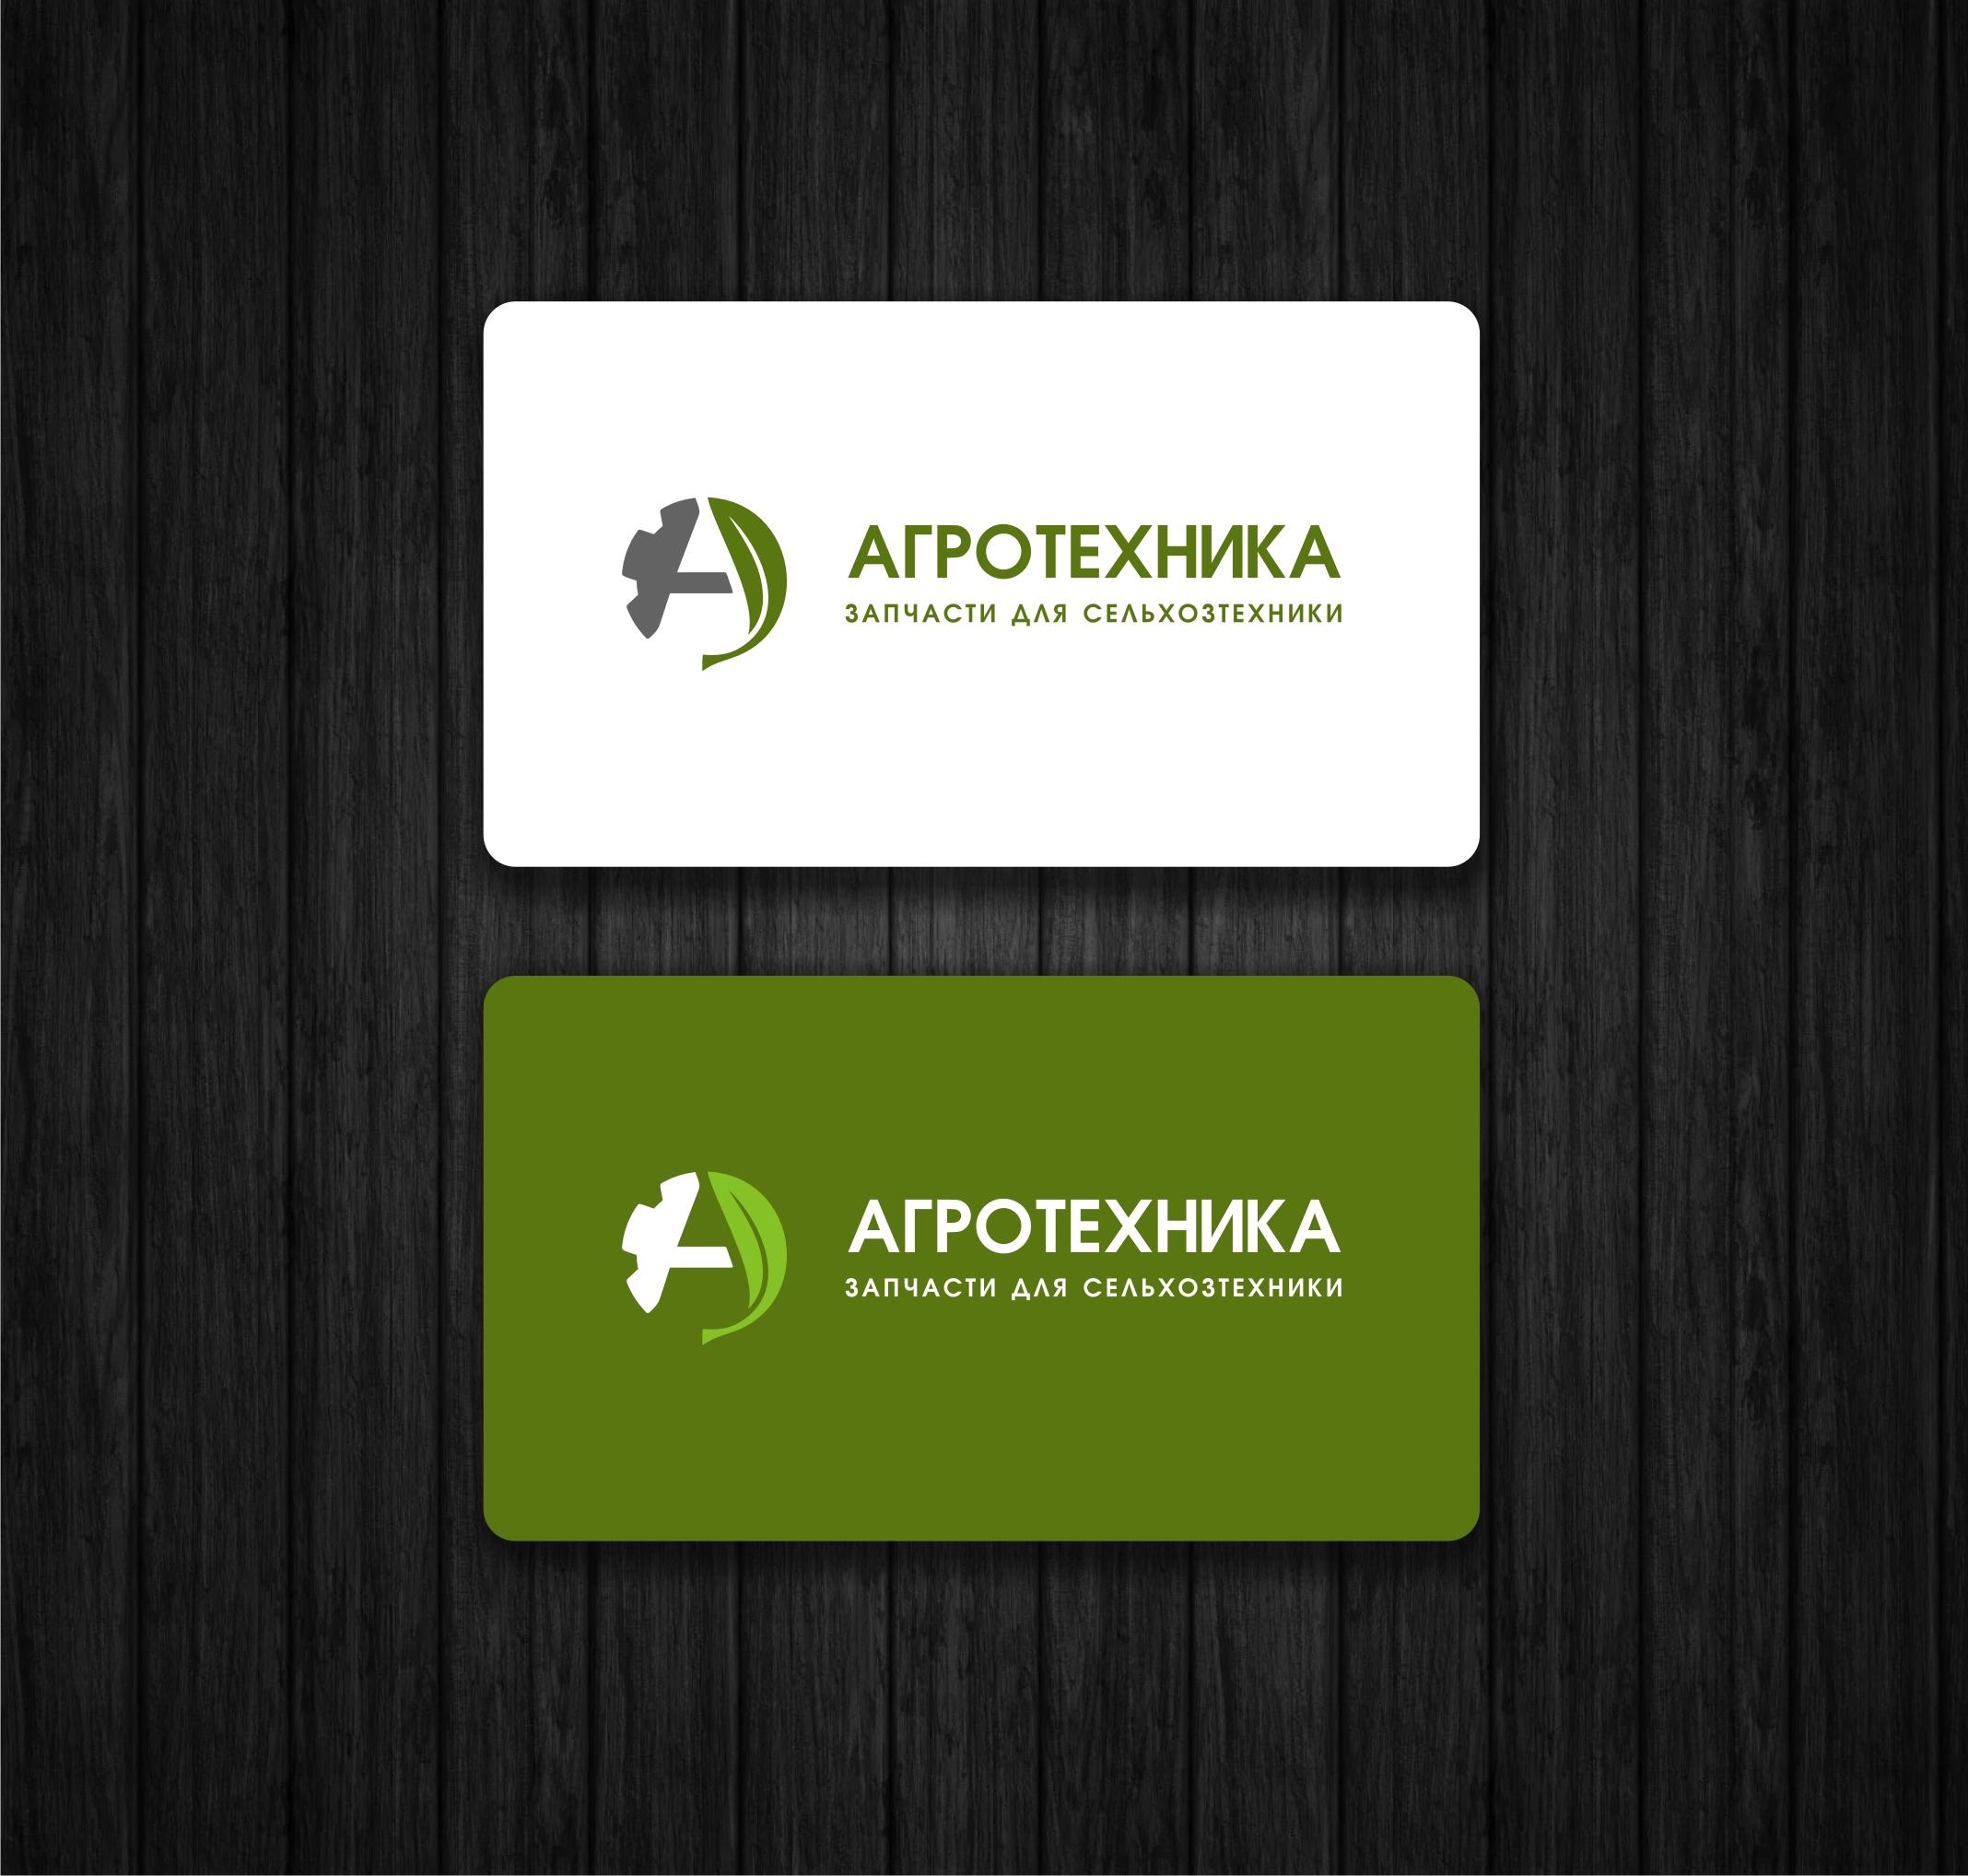 Разработка логотипа для компании Агротехника фото f_6765c0267030248d.jpg